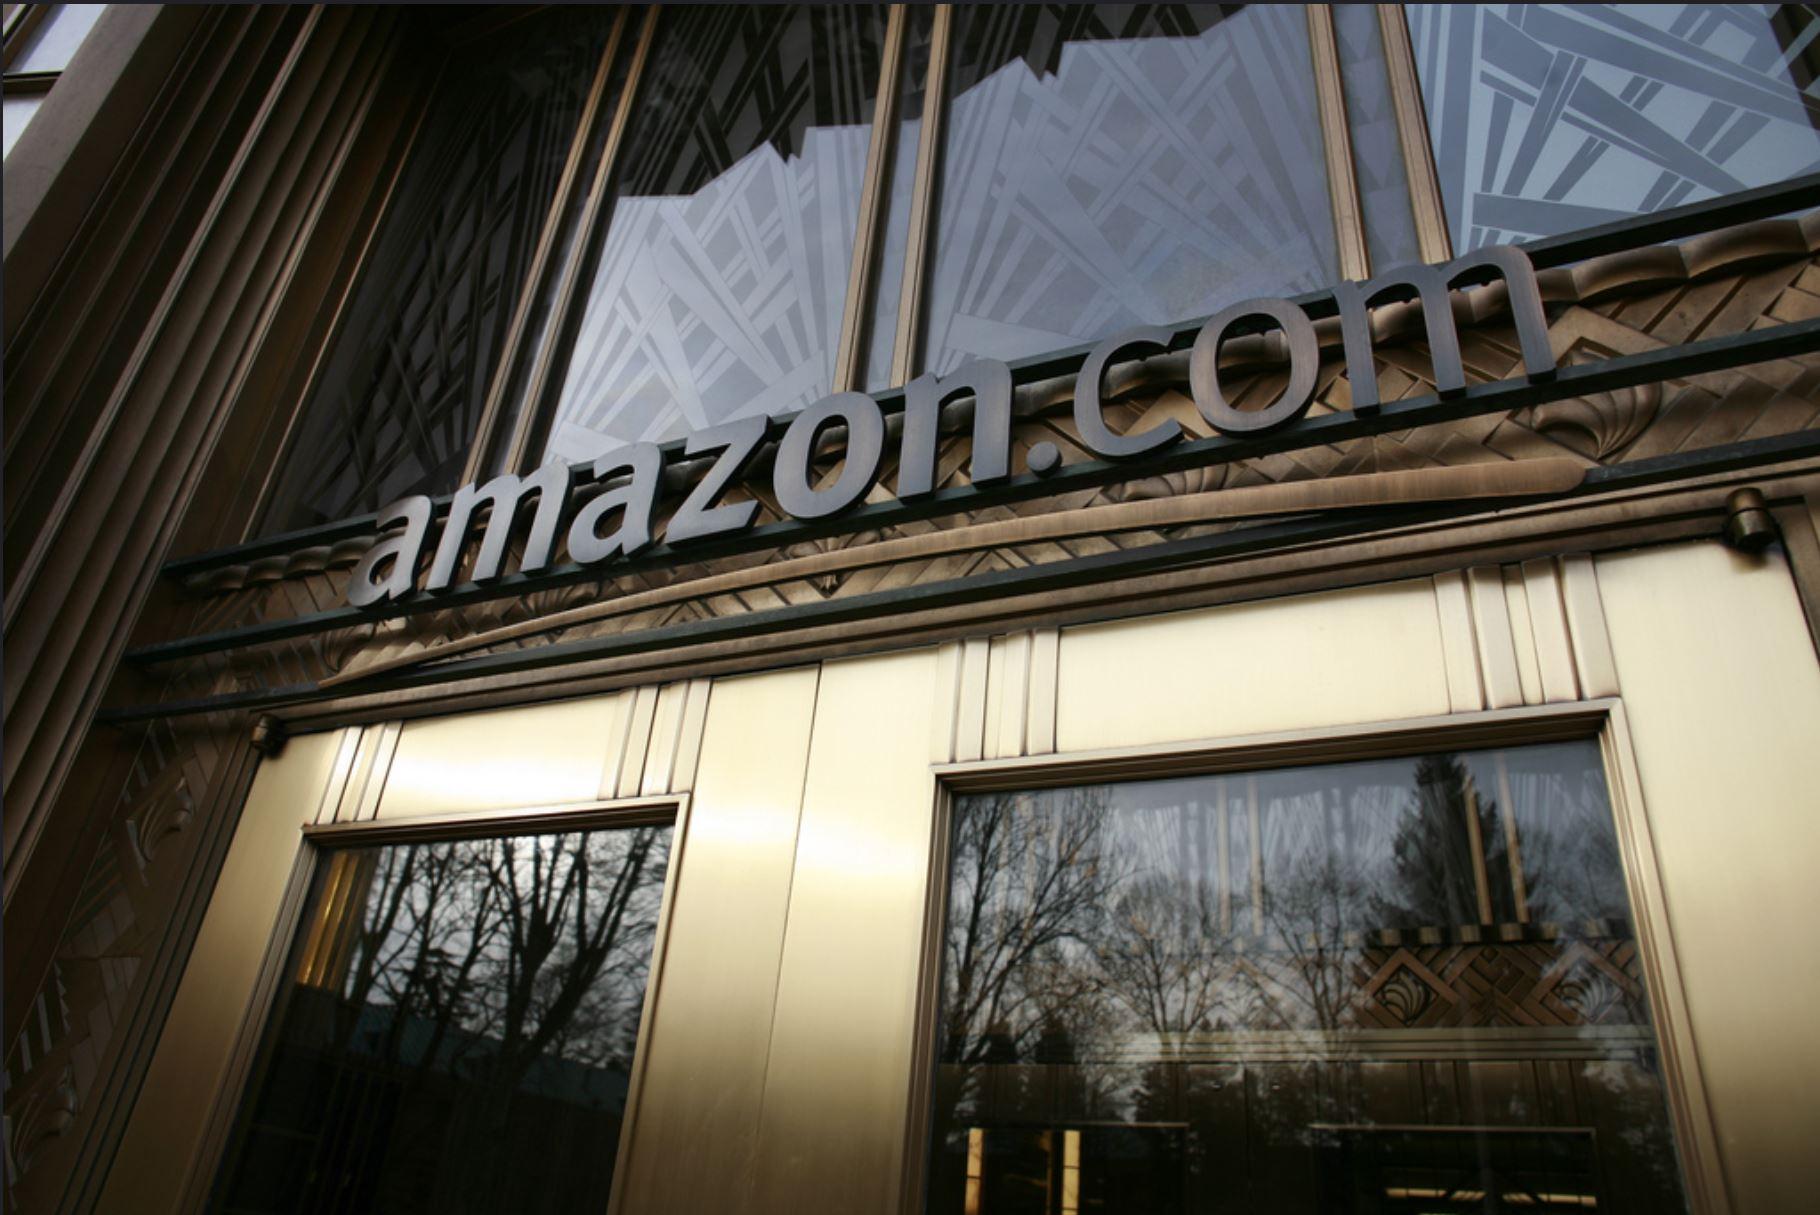 Amazon headquarters in Seattle, WA. Photo by Robert Scoble